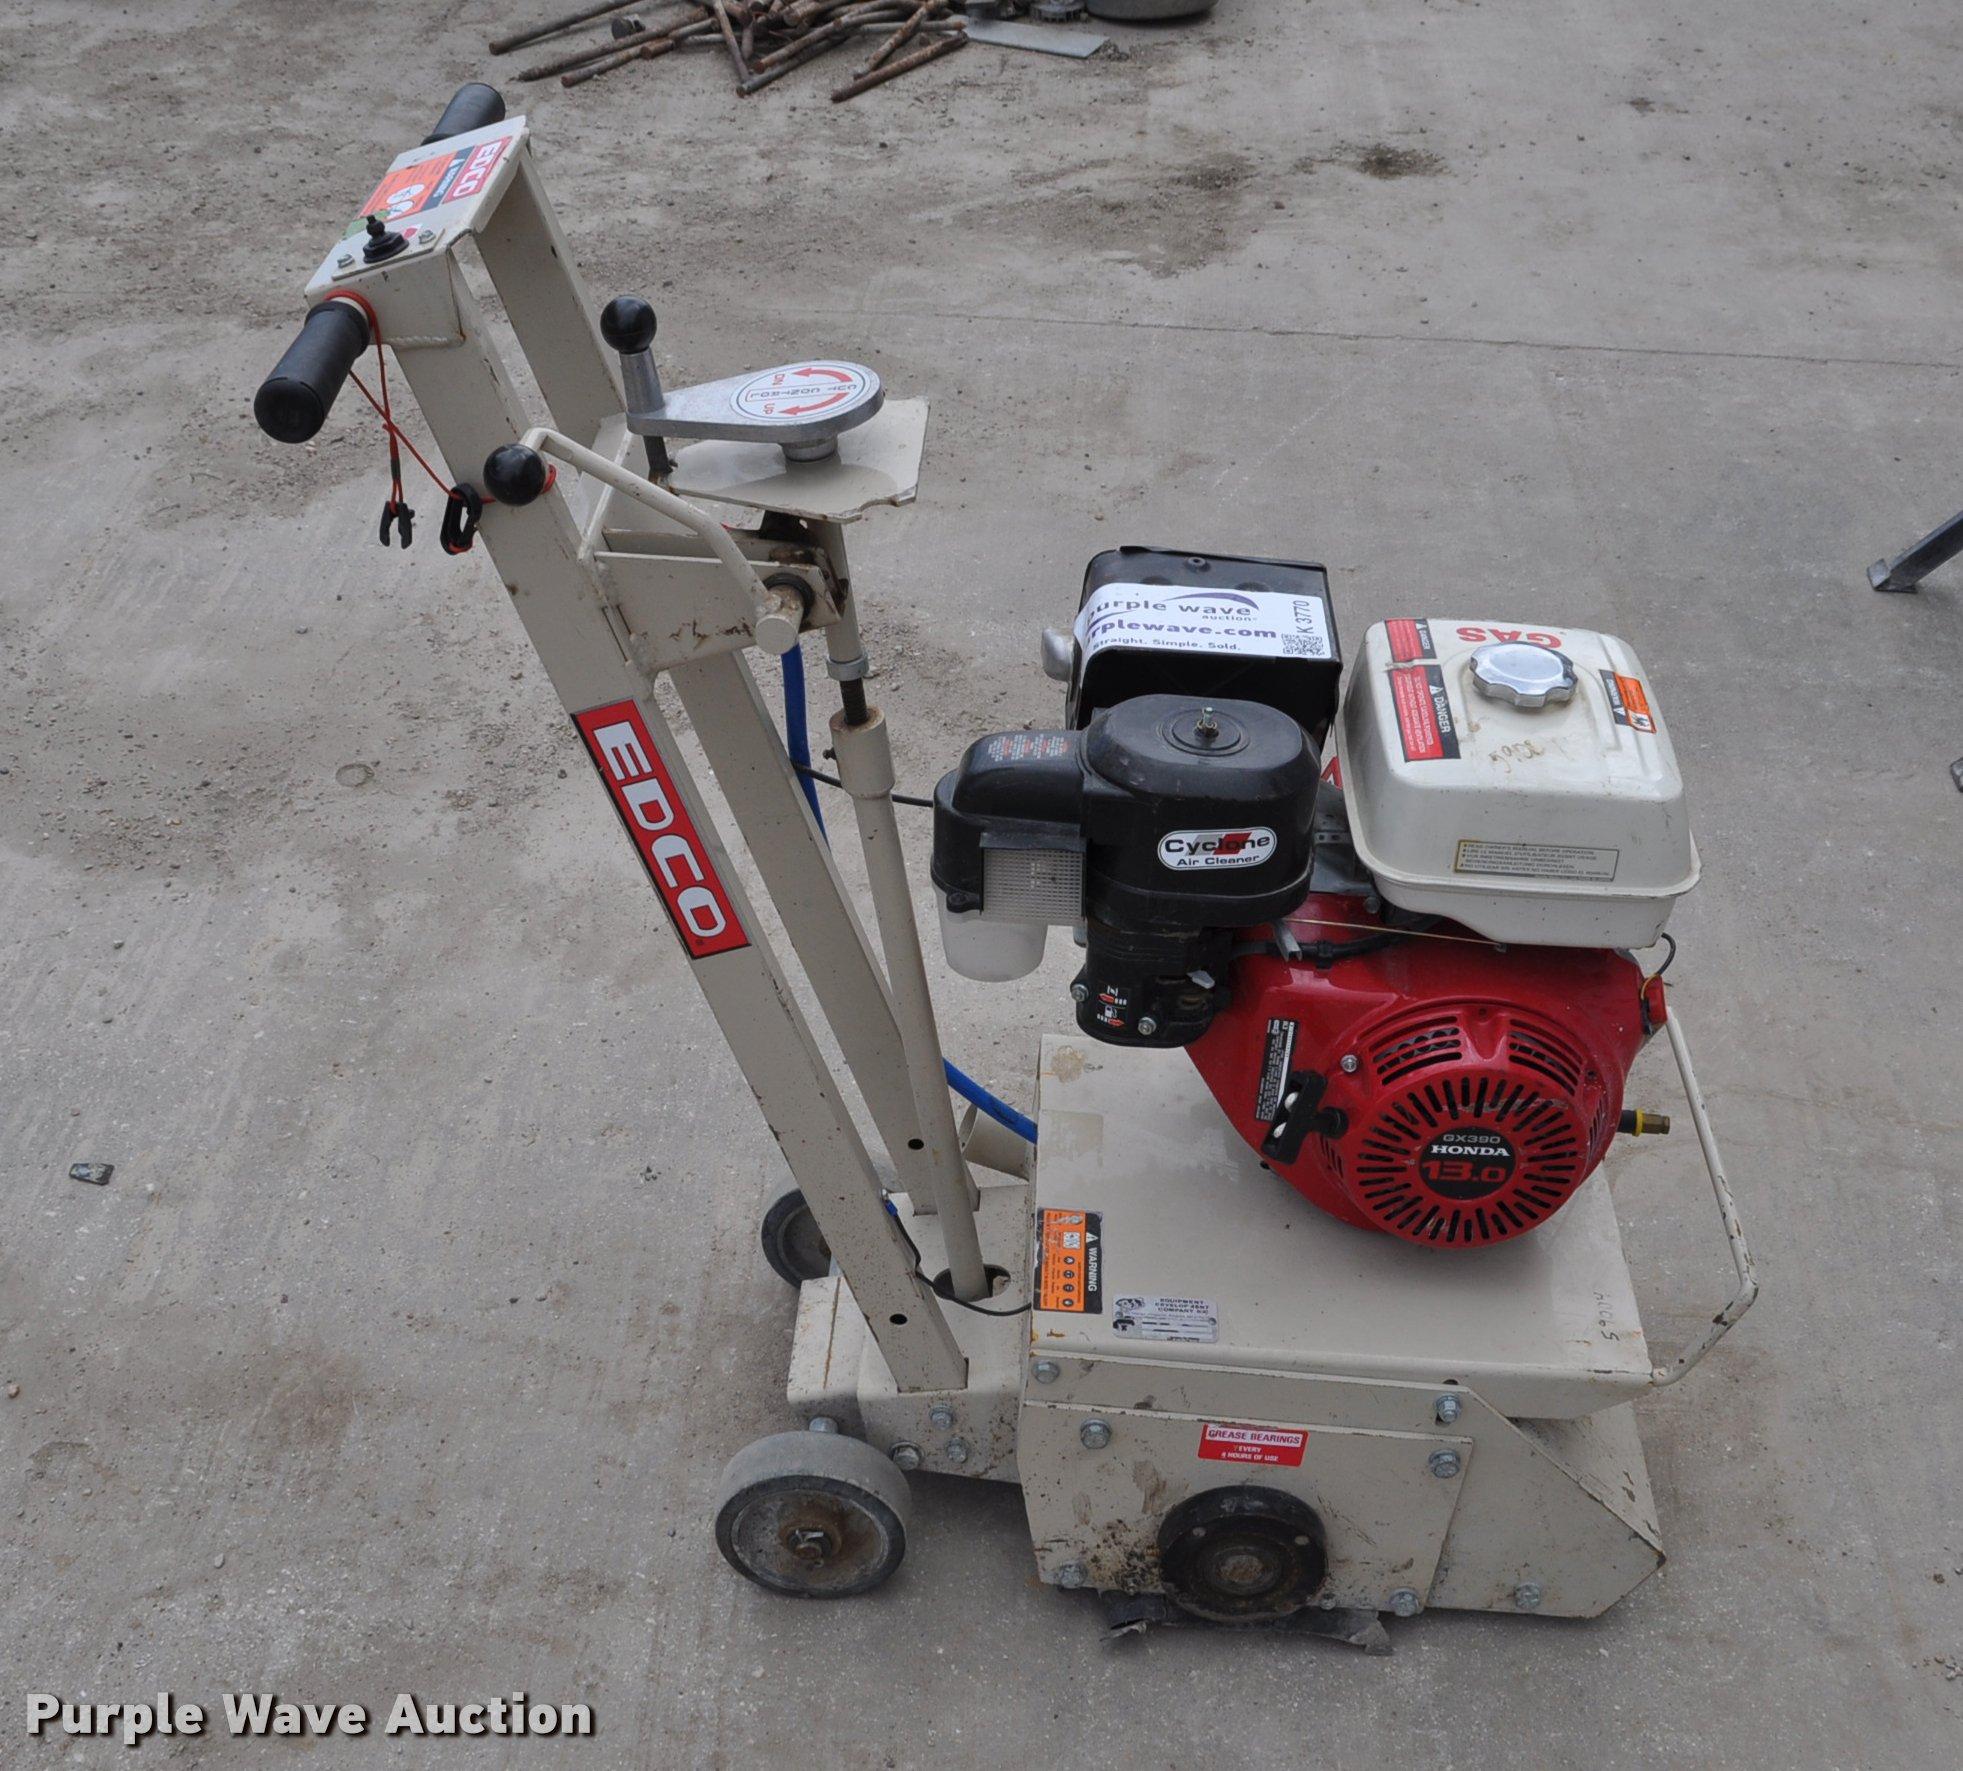 Edco CPM10-13H concrete groove grinder   Item K3770   SOLD!